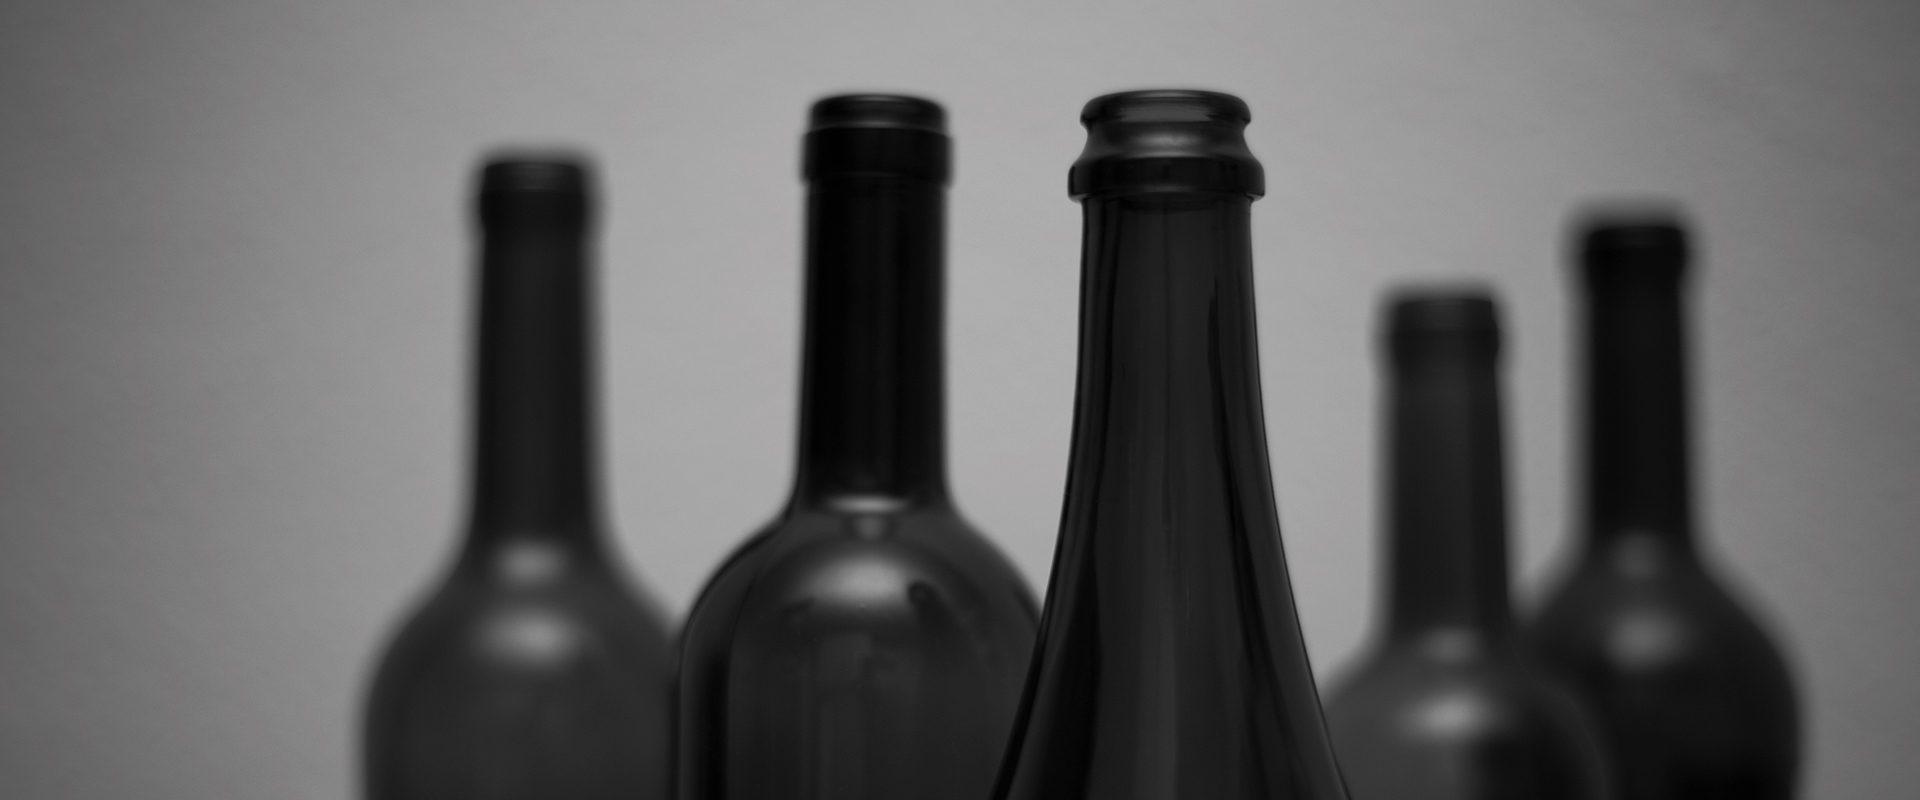 Heilbronner Weinmarketingtag